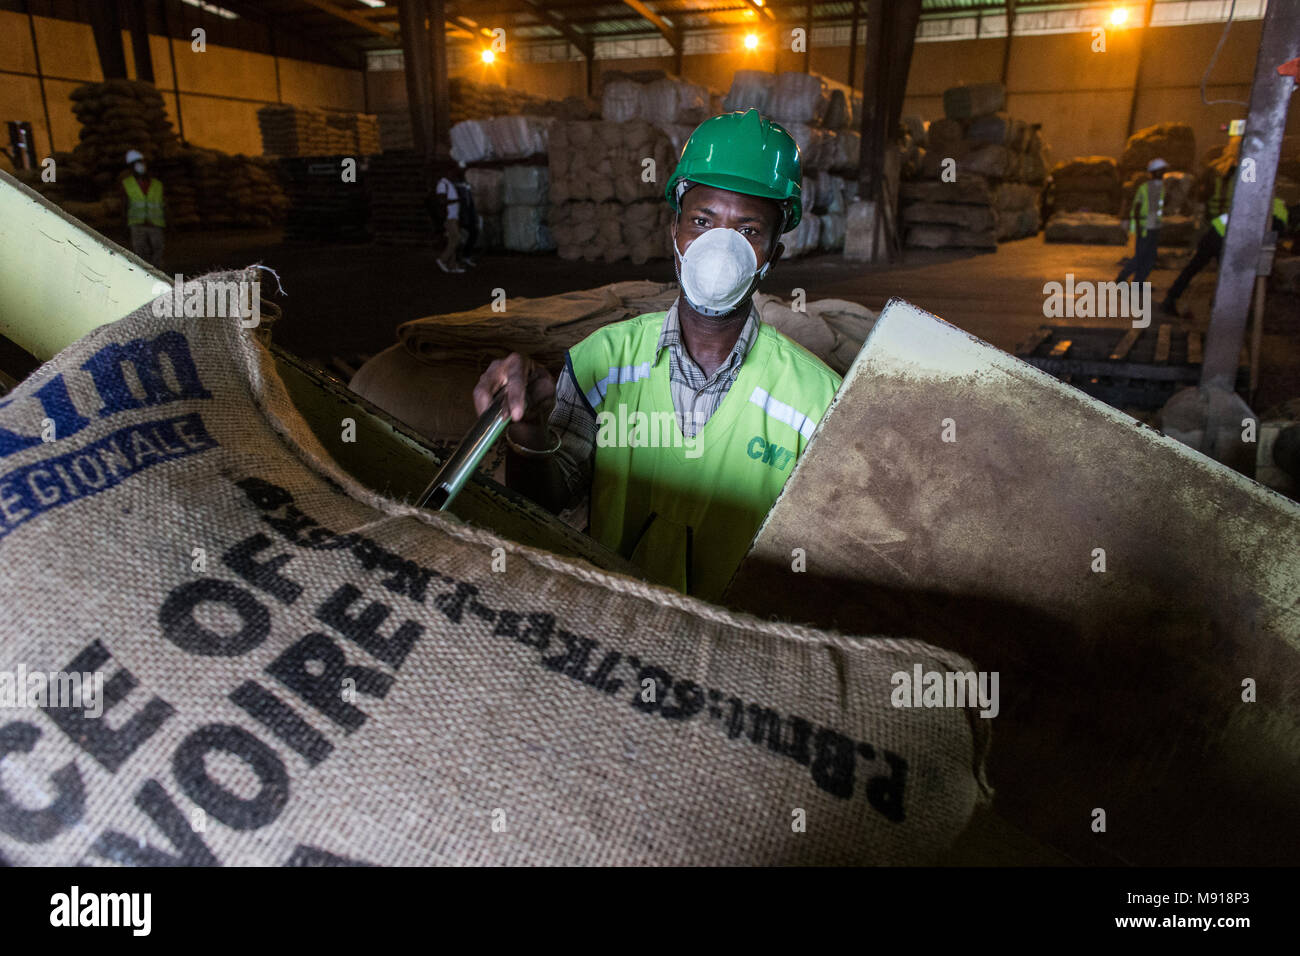 Cocoa humidity check at Abidjan port facilities, Ivory Coast. - Stock Image